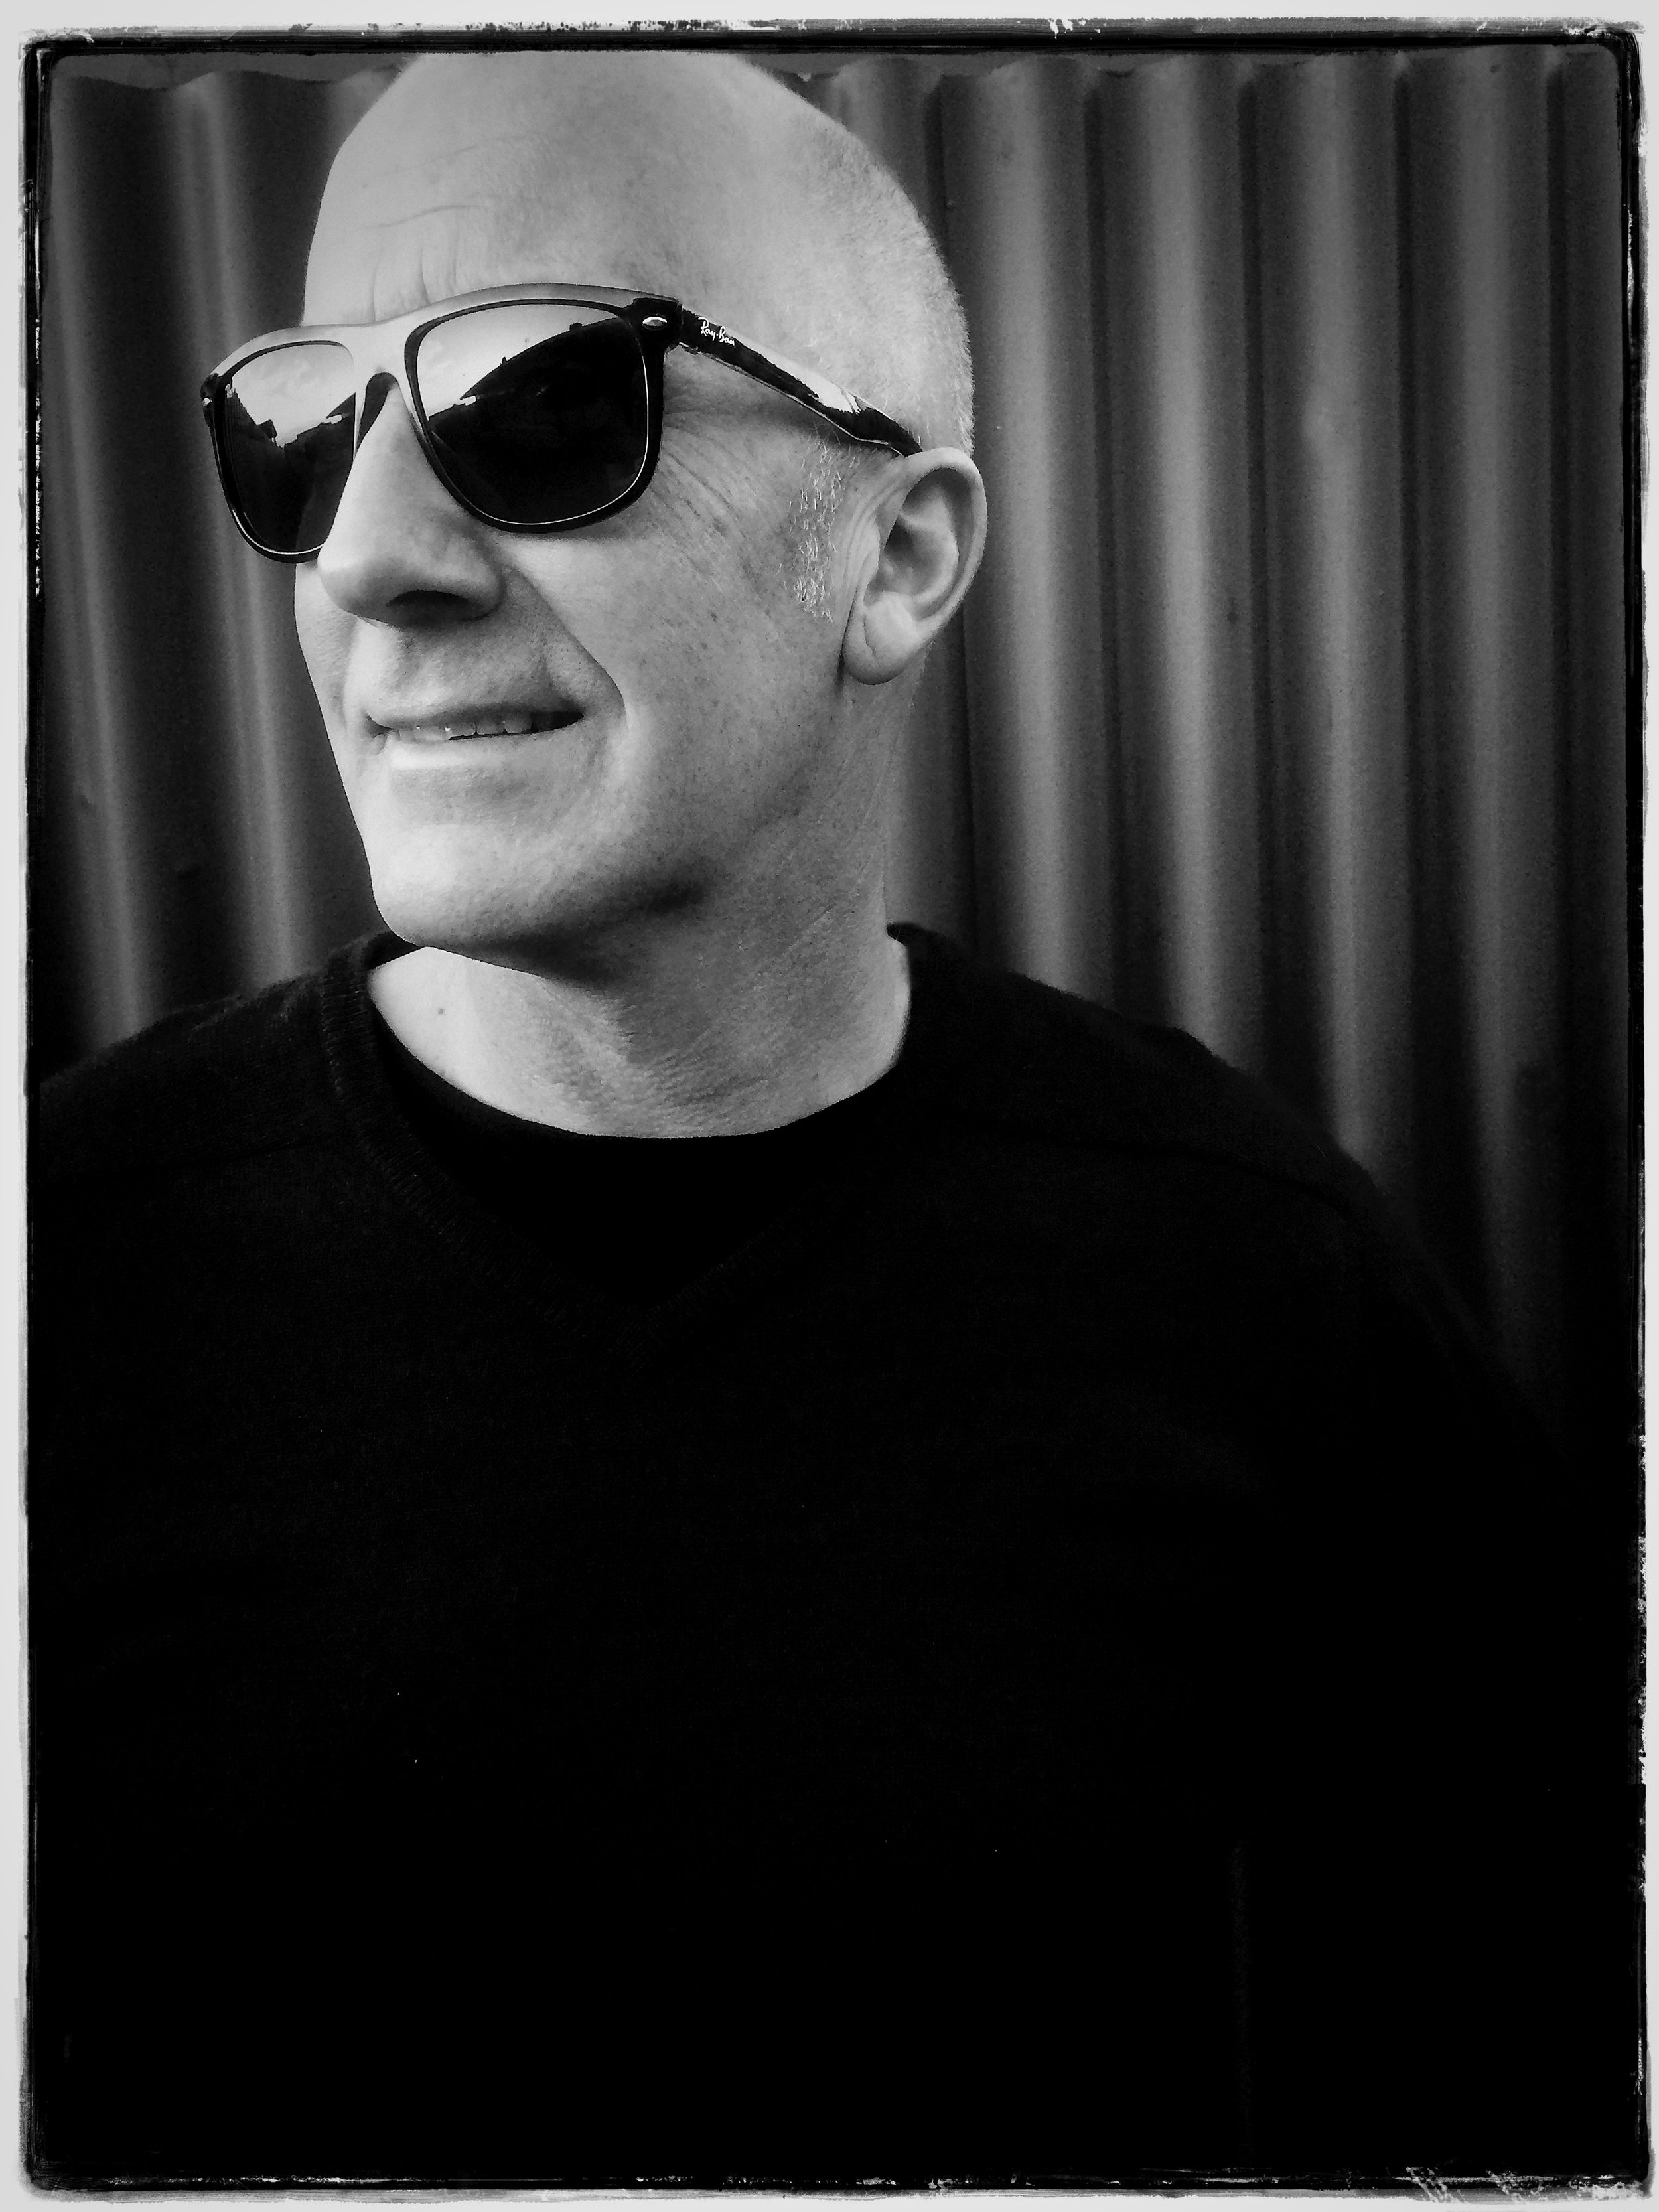 Tony Reddrop Fringe Portrait  small.jpg